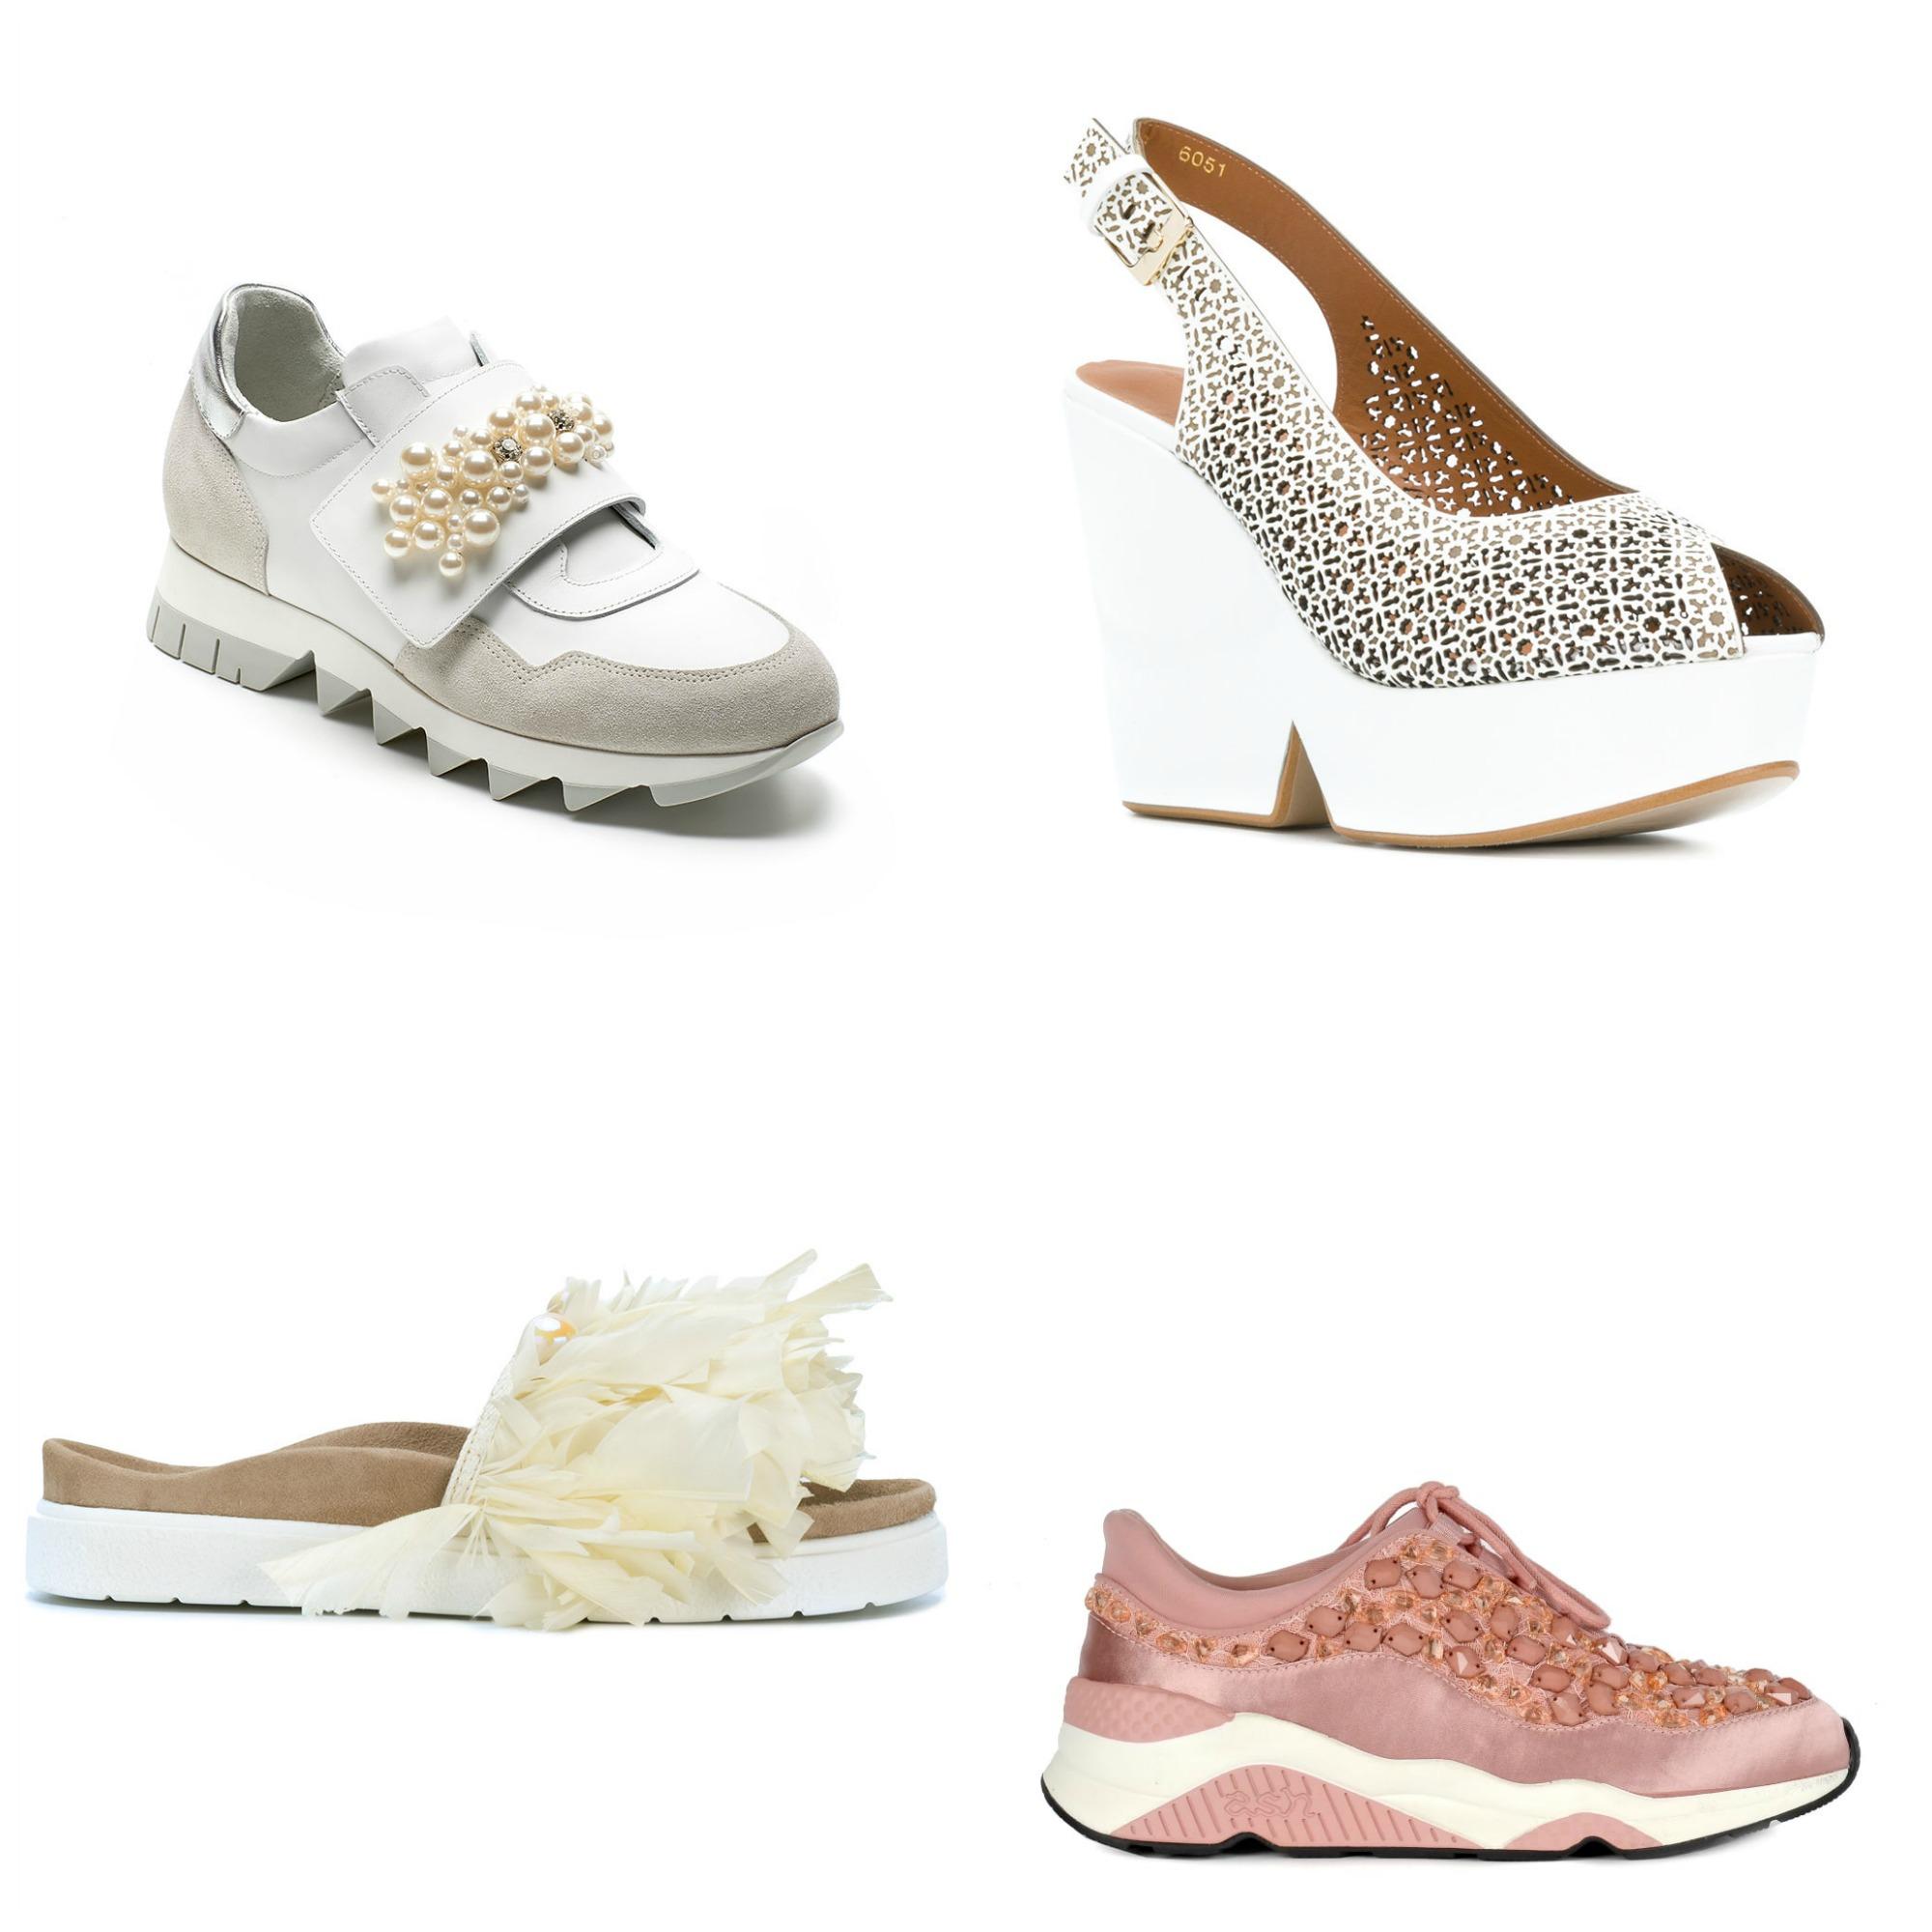 shoe collage.jpg